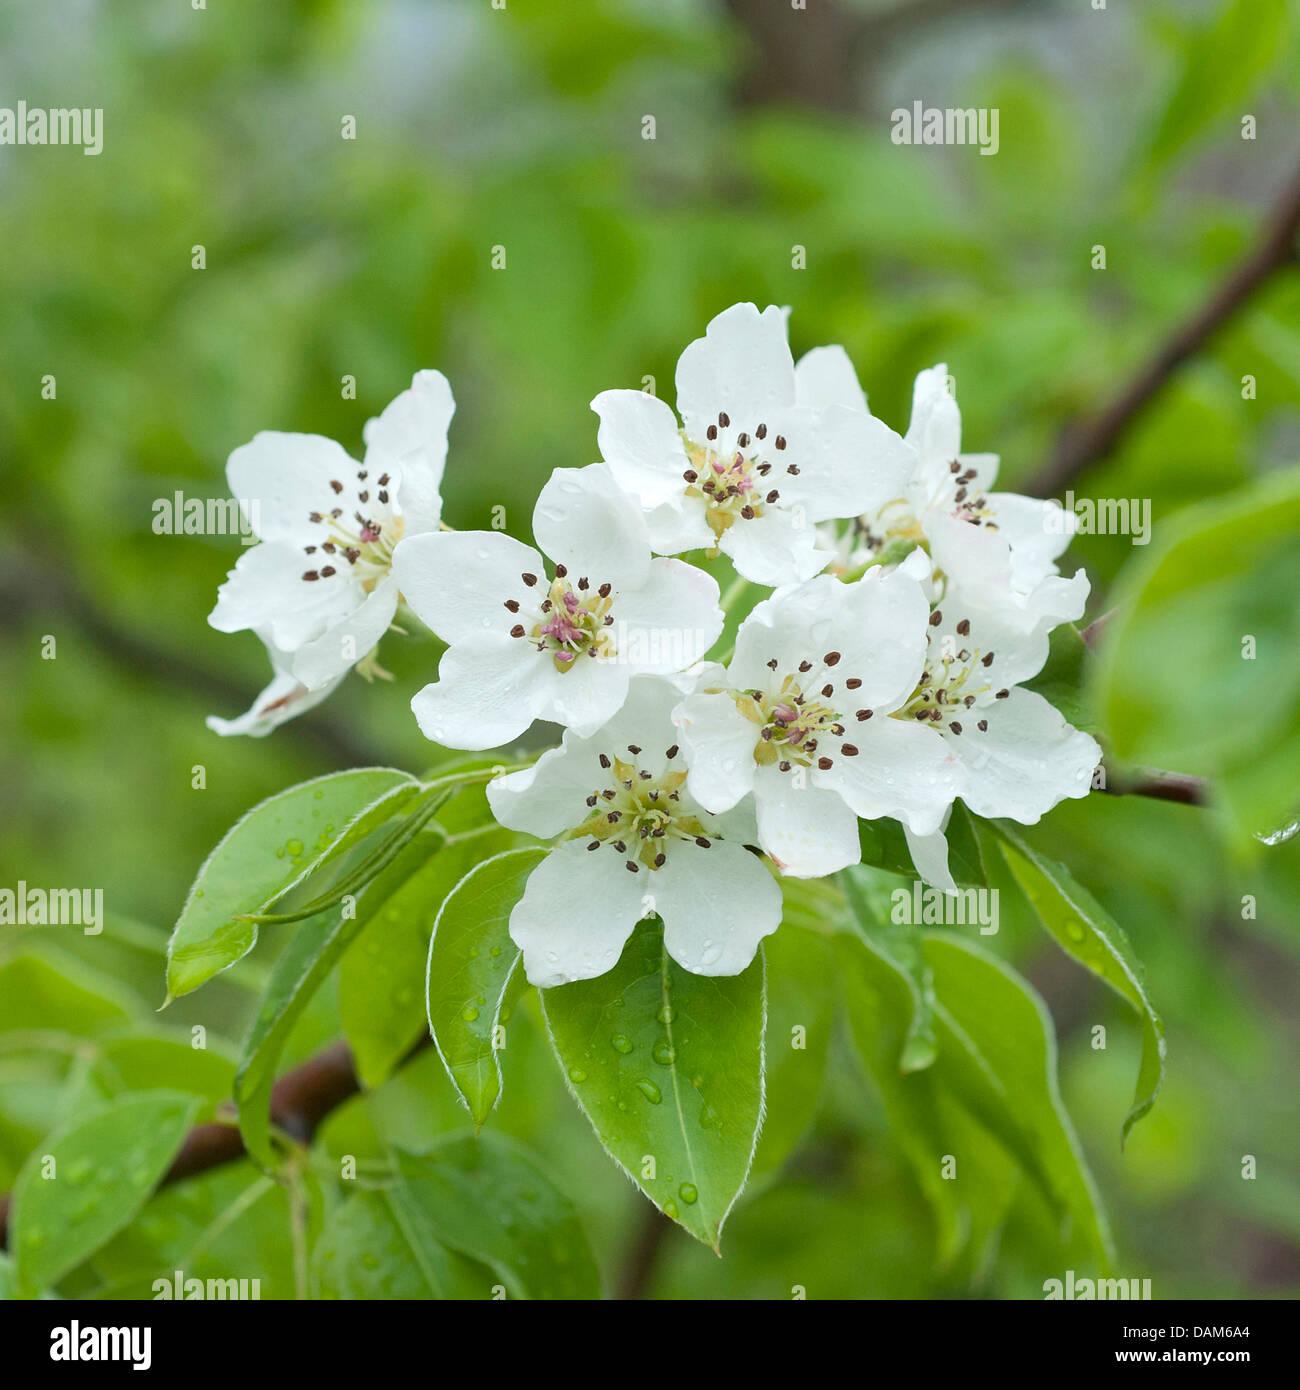 Regel pear (Pyrus regelii), blooming branch, Germany, Saxony - Stock Image